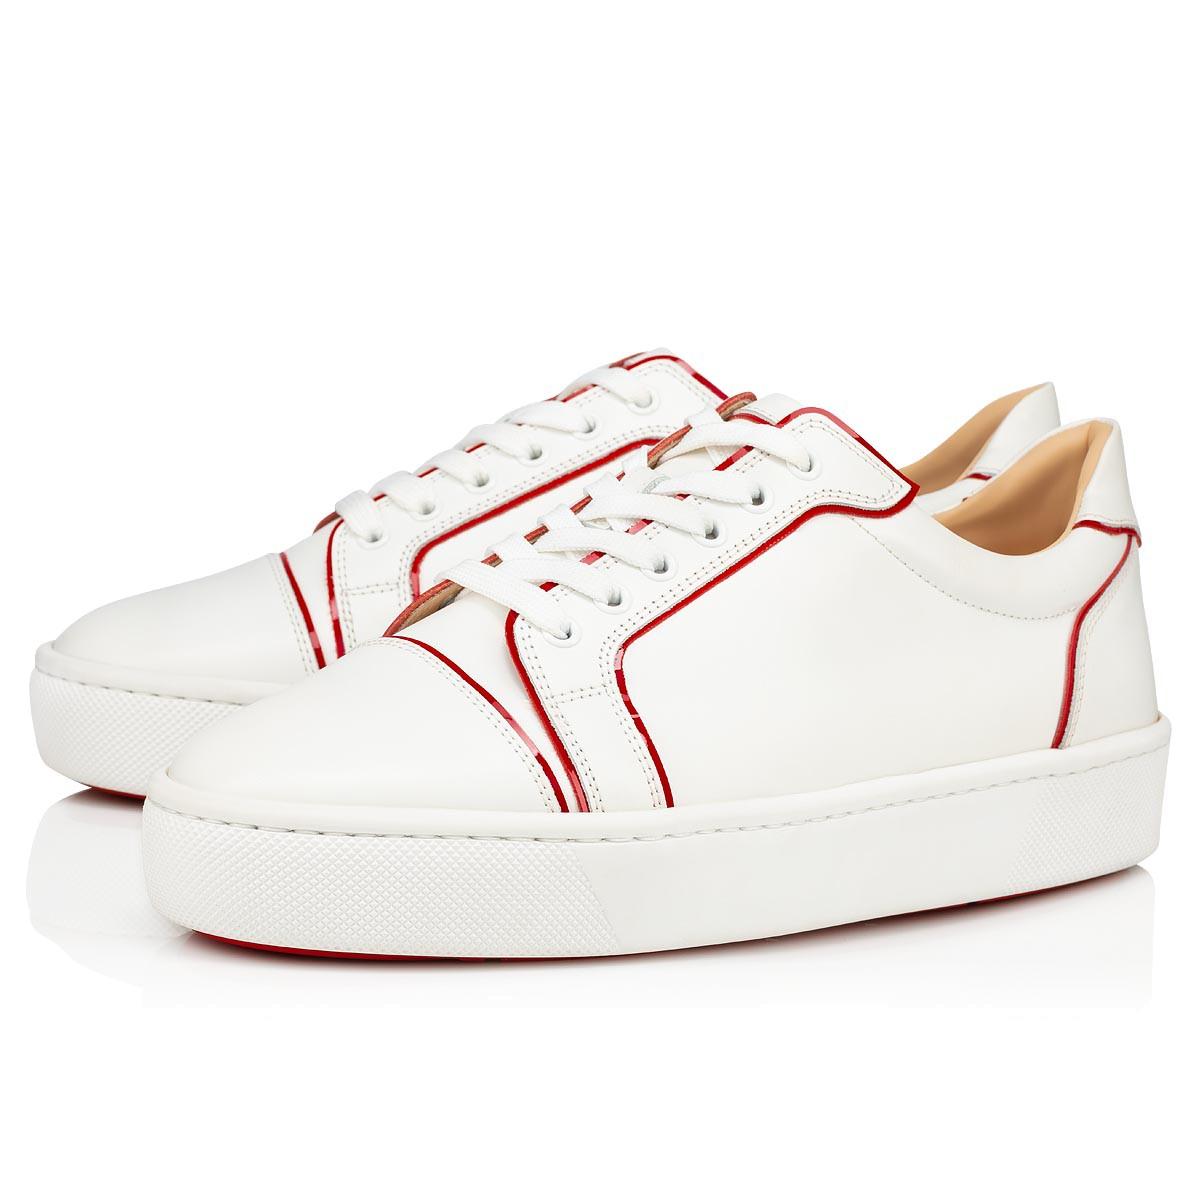 Shoes - Seavastissimo Flat - Christian Louboutin